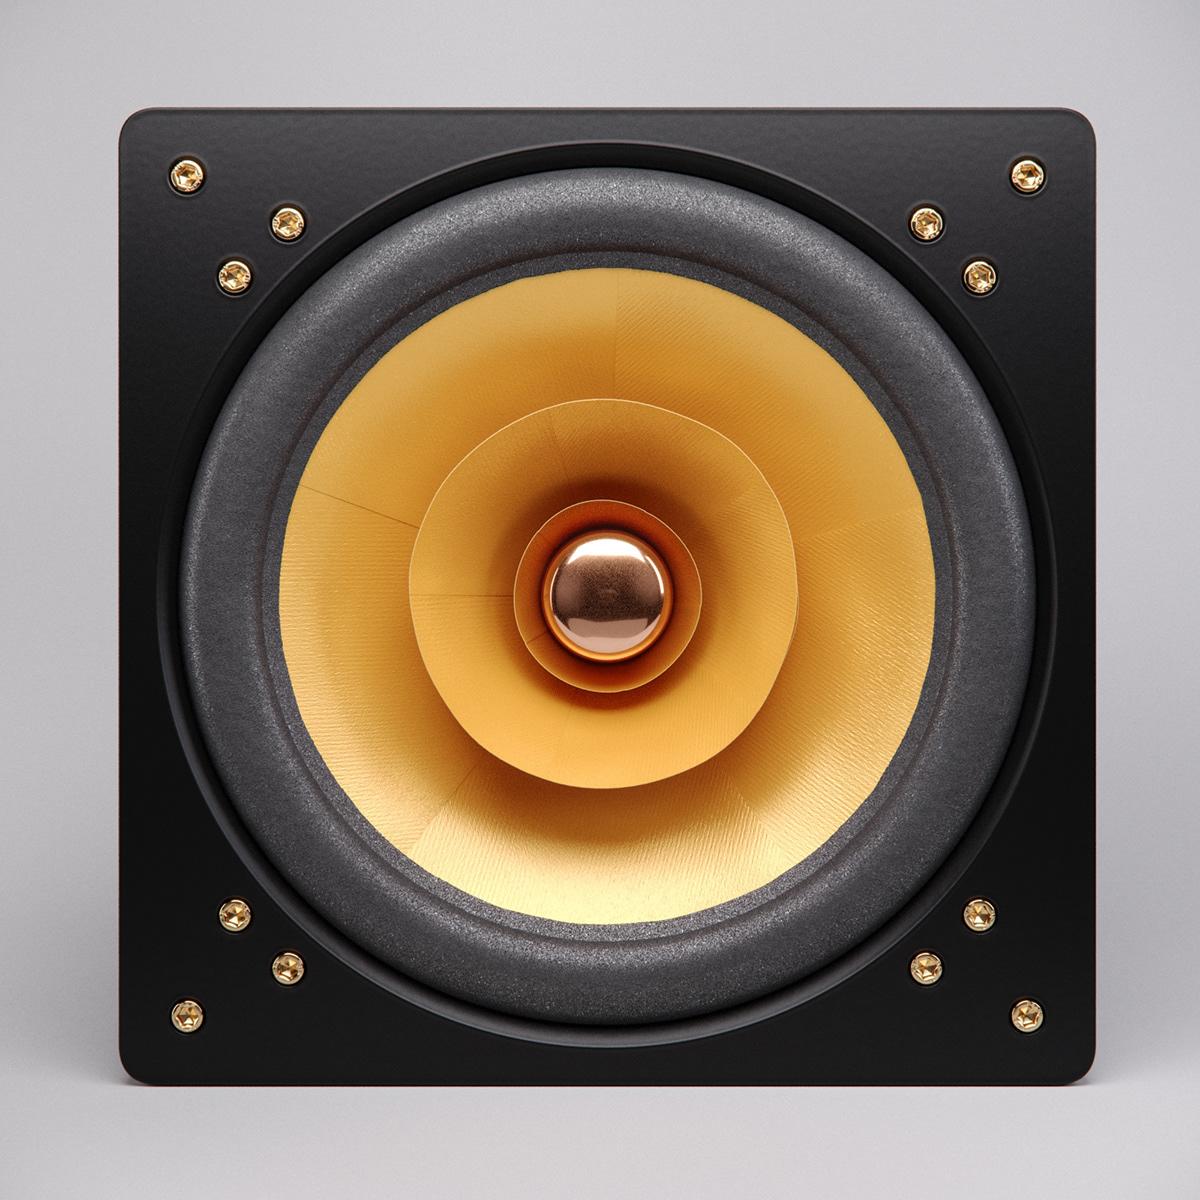 3D fullrange product product3d rendering speakers visualisation